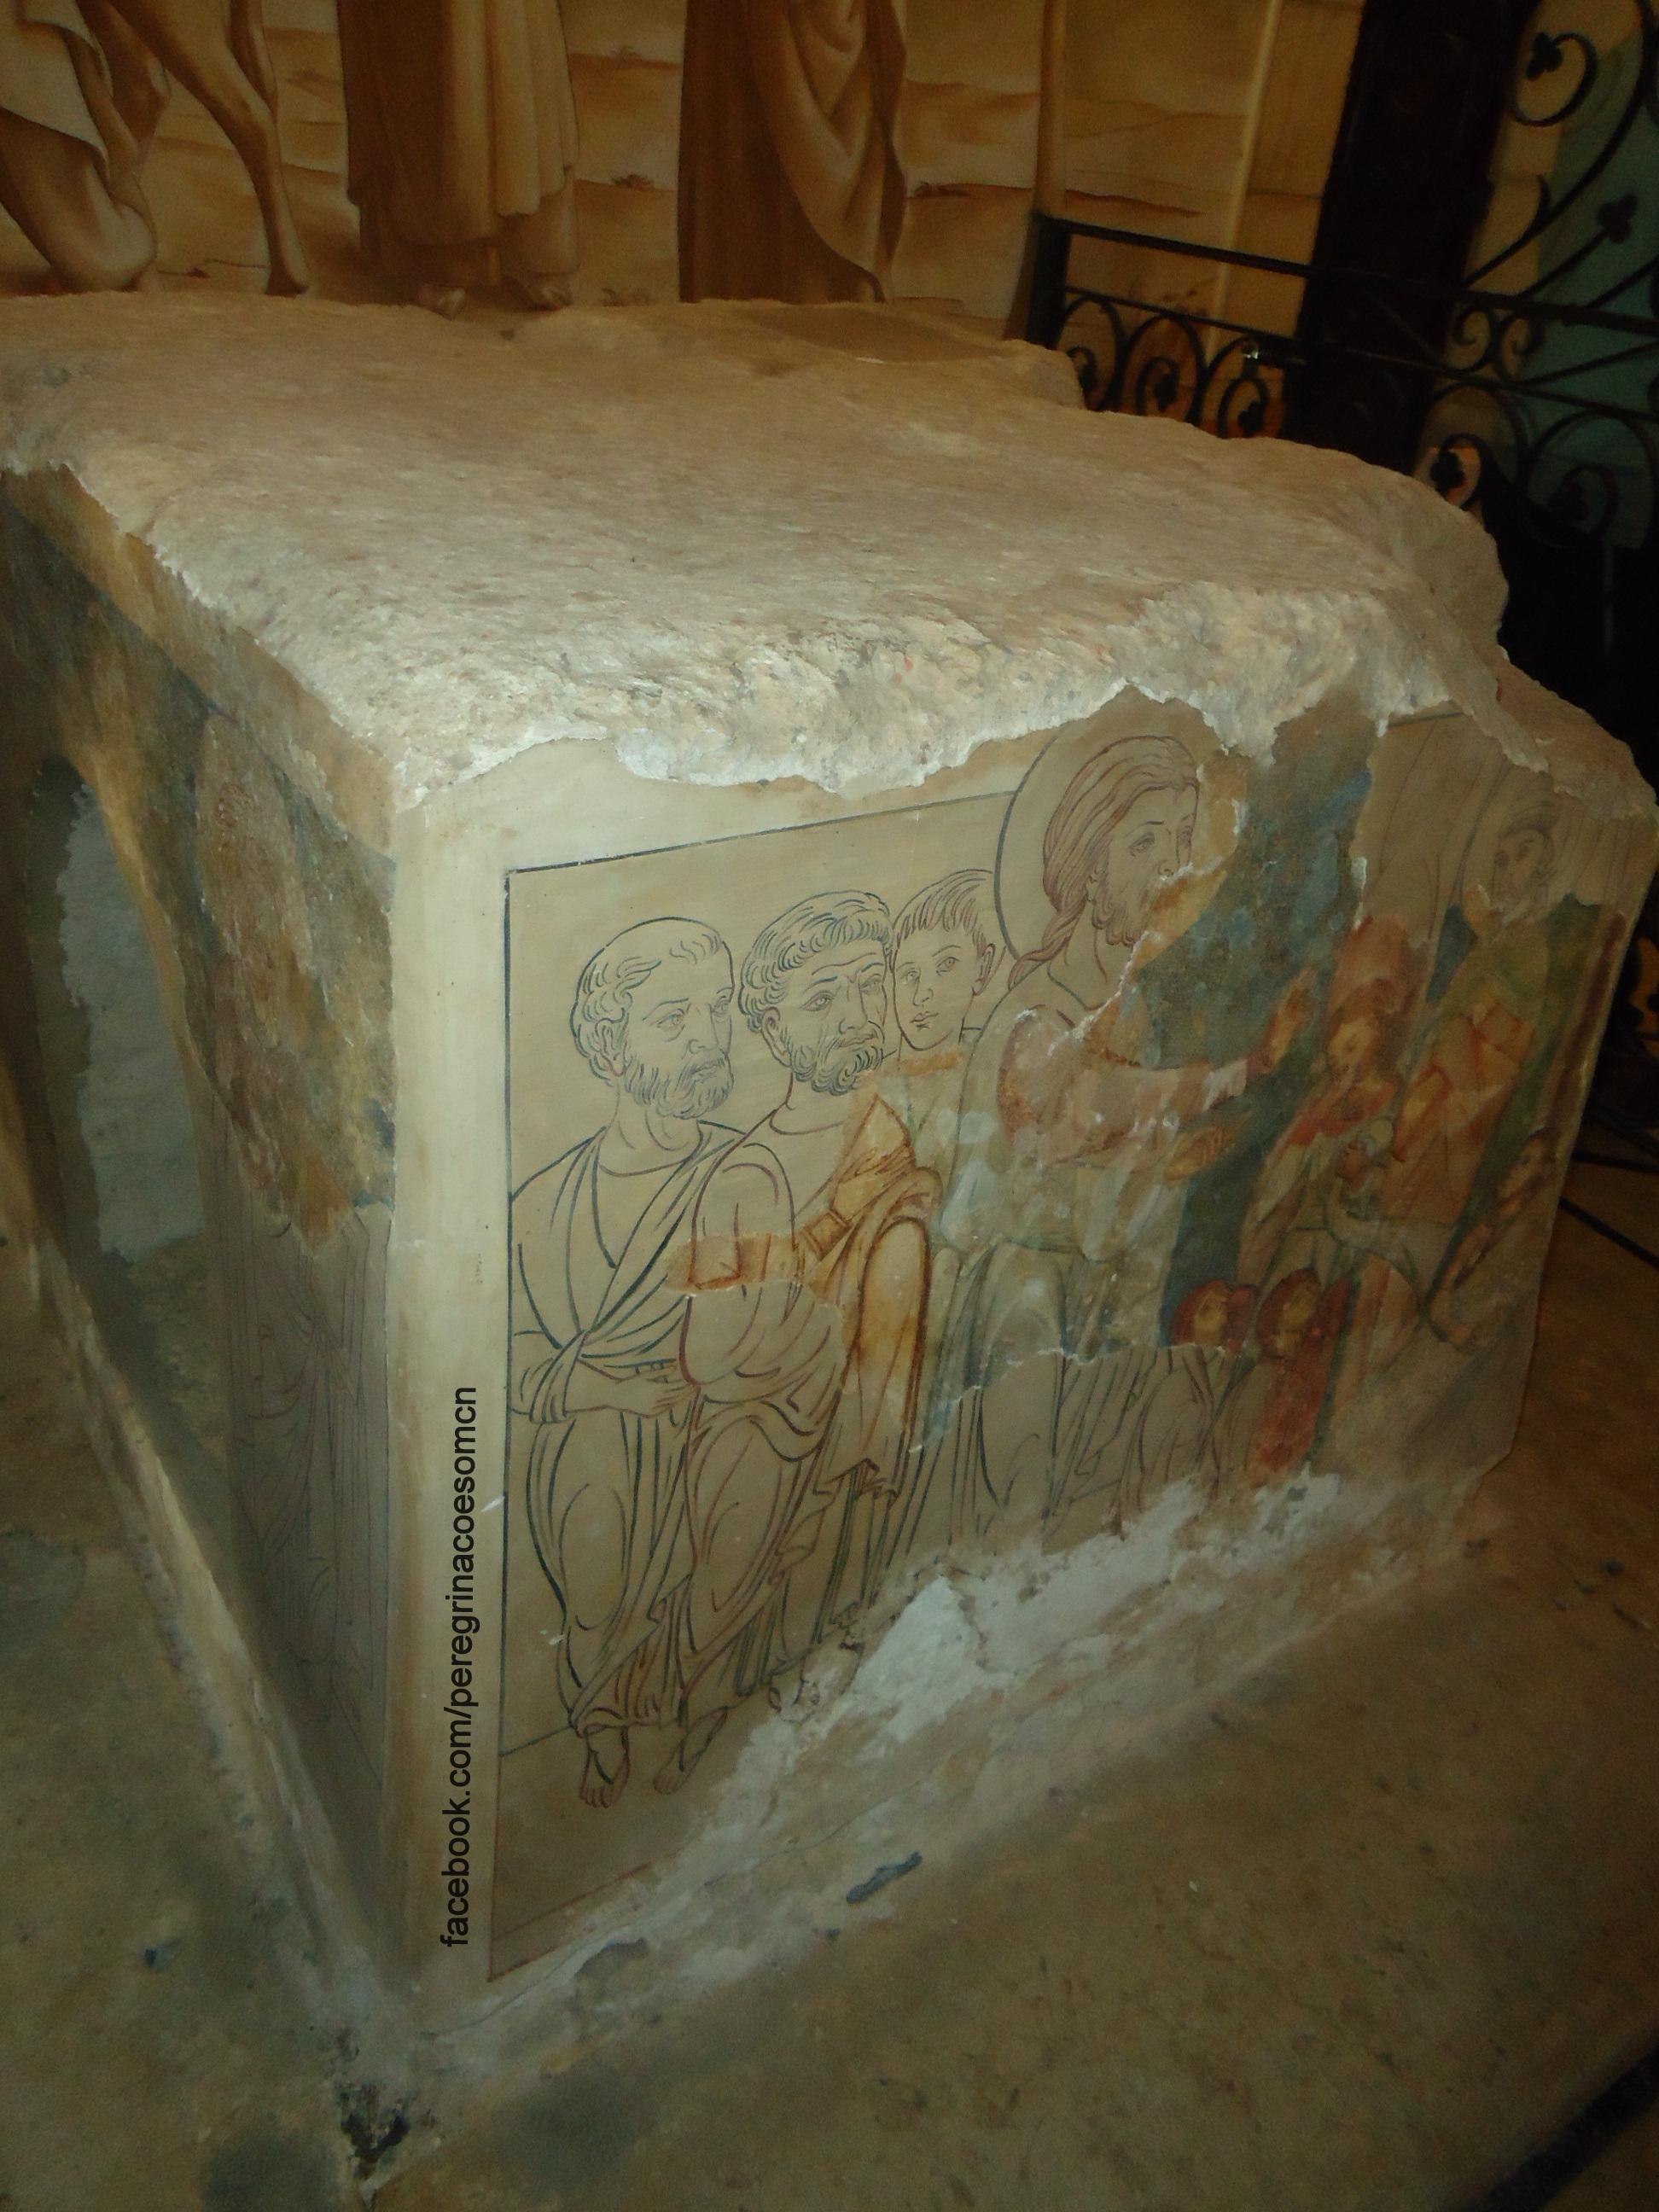 Pedra cúbica pintada no tempo dos Cruzados